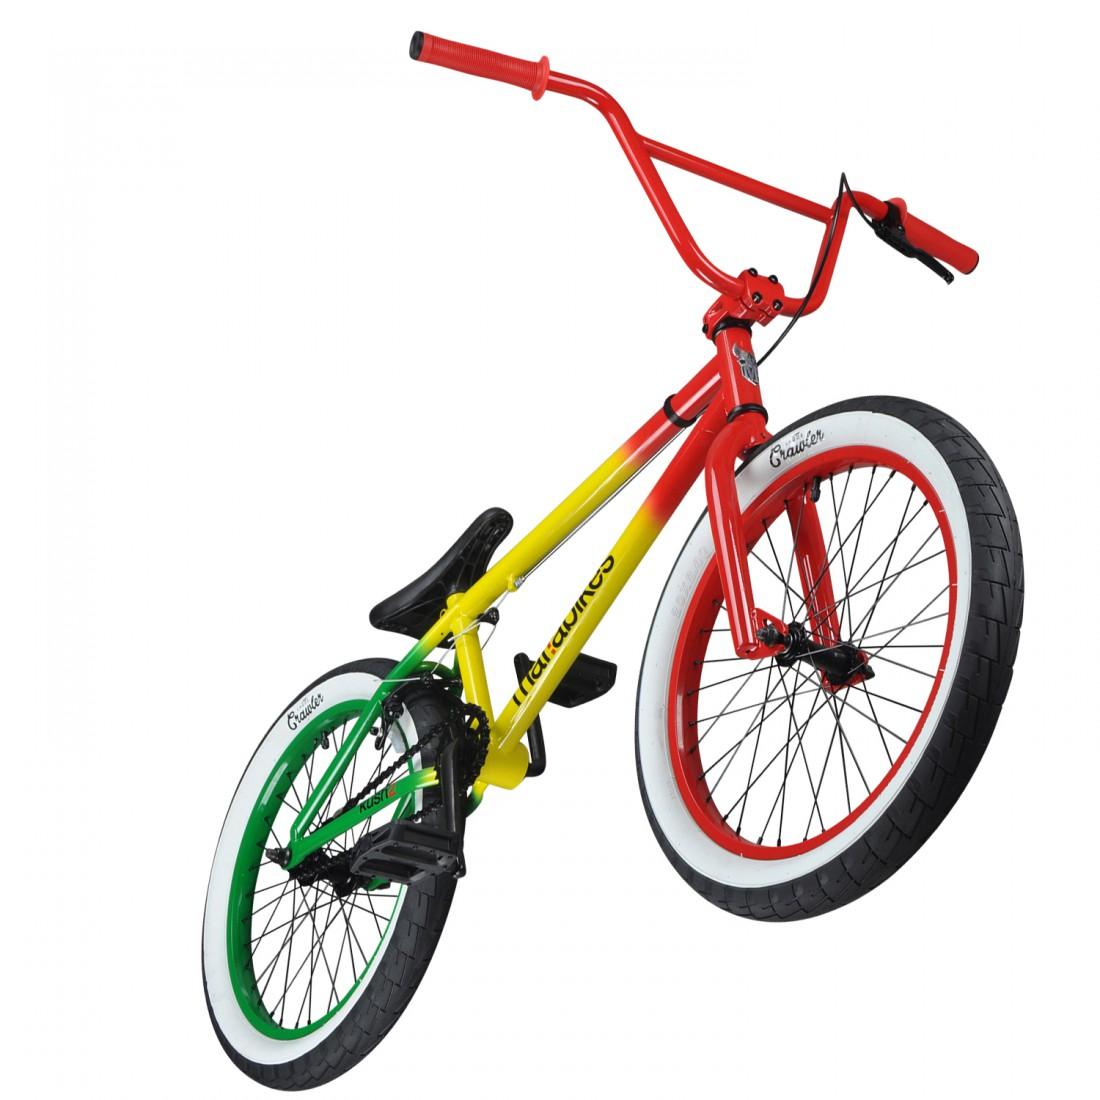 mafiabikes kush2 20 zoll bmx bike fahrrad verschiedene. Black Bedroom Furniture Sets. Home Design Ideas